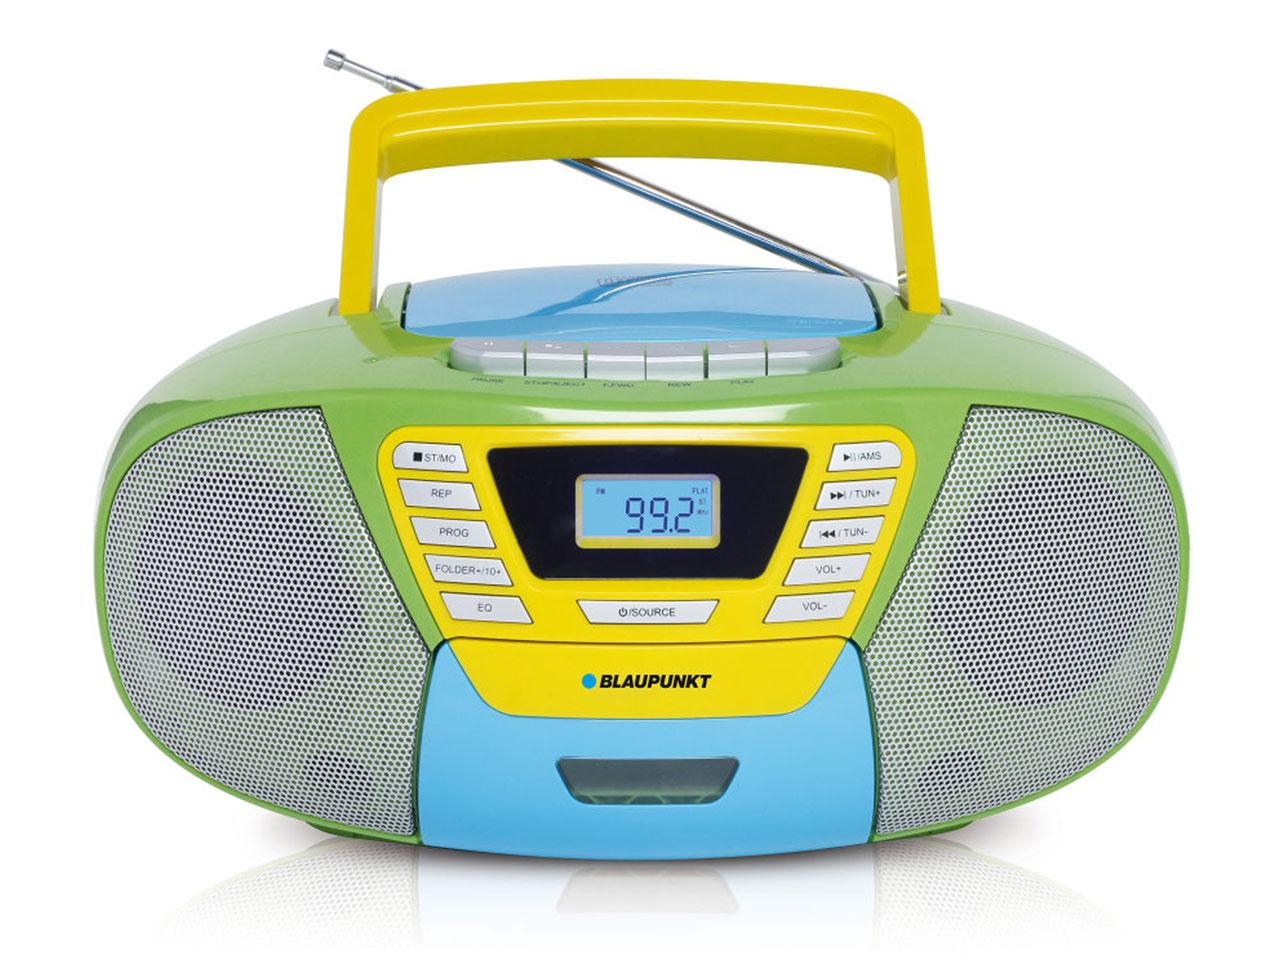 CD přehrávač BLAUPUNKT Boombox s CD a USB, barevný